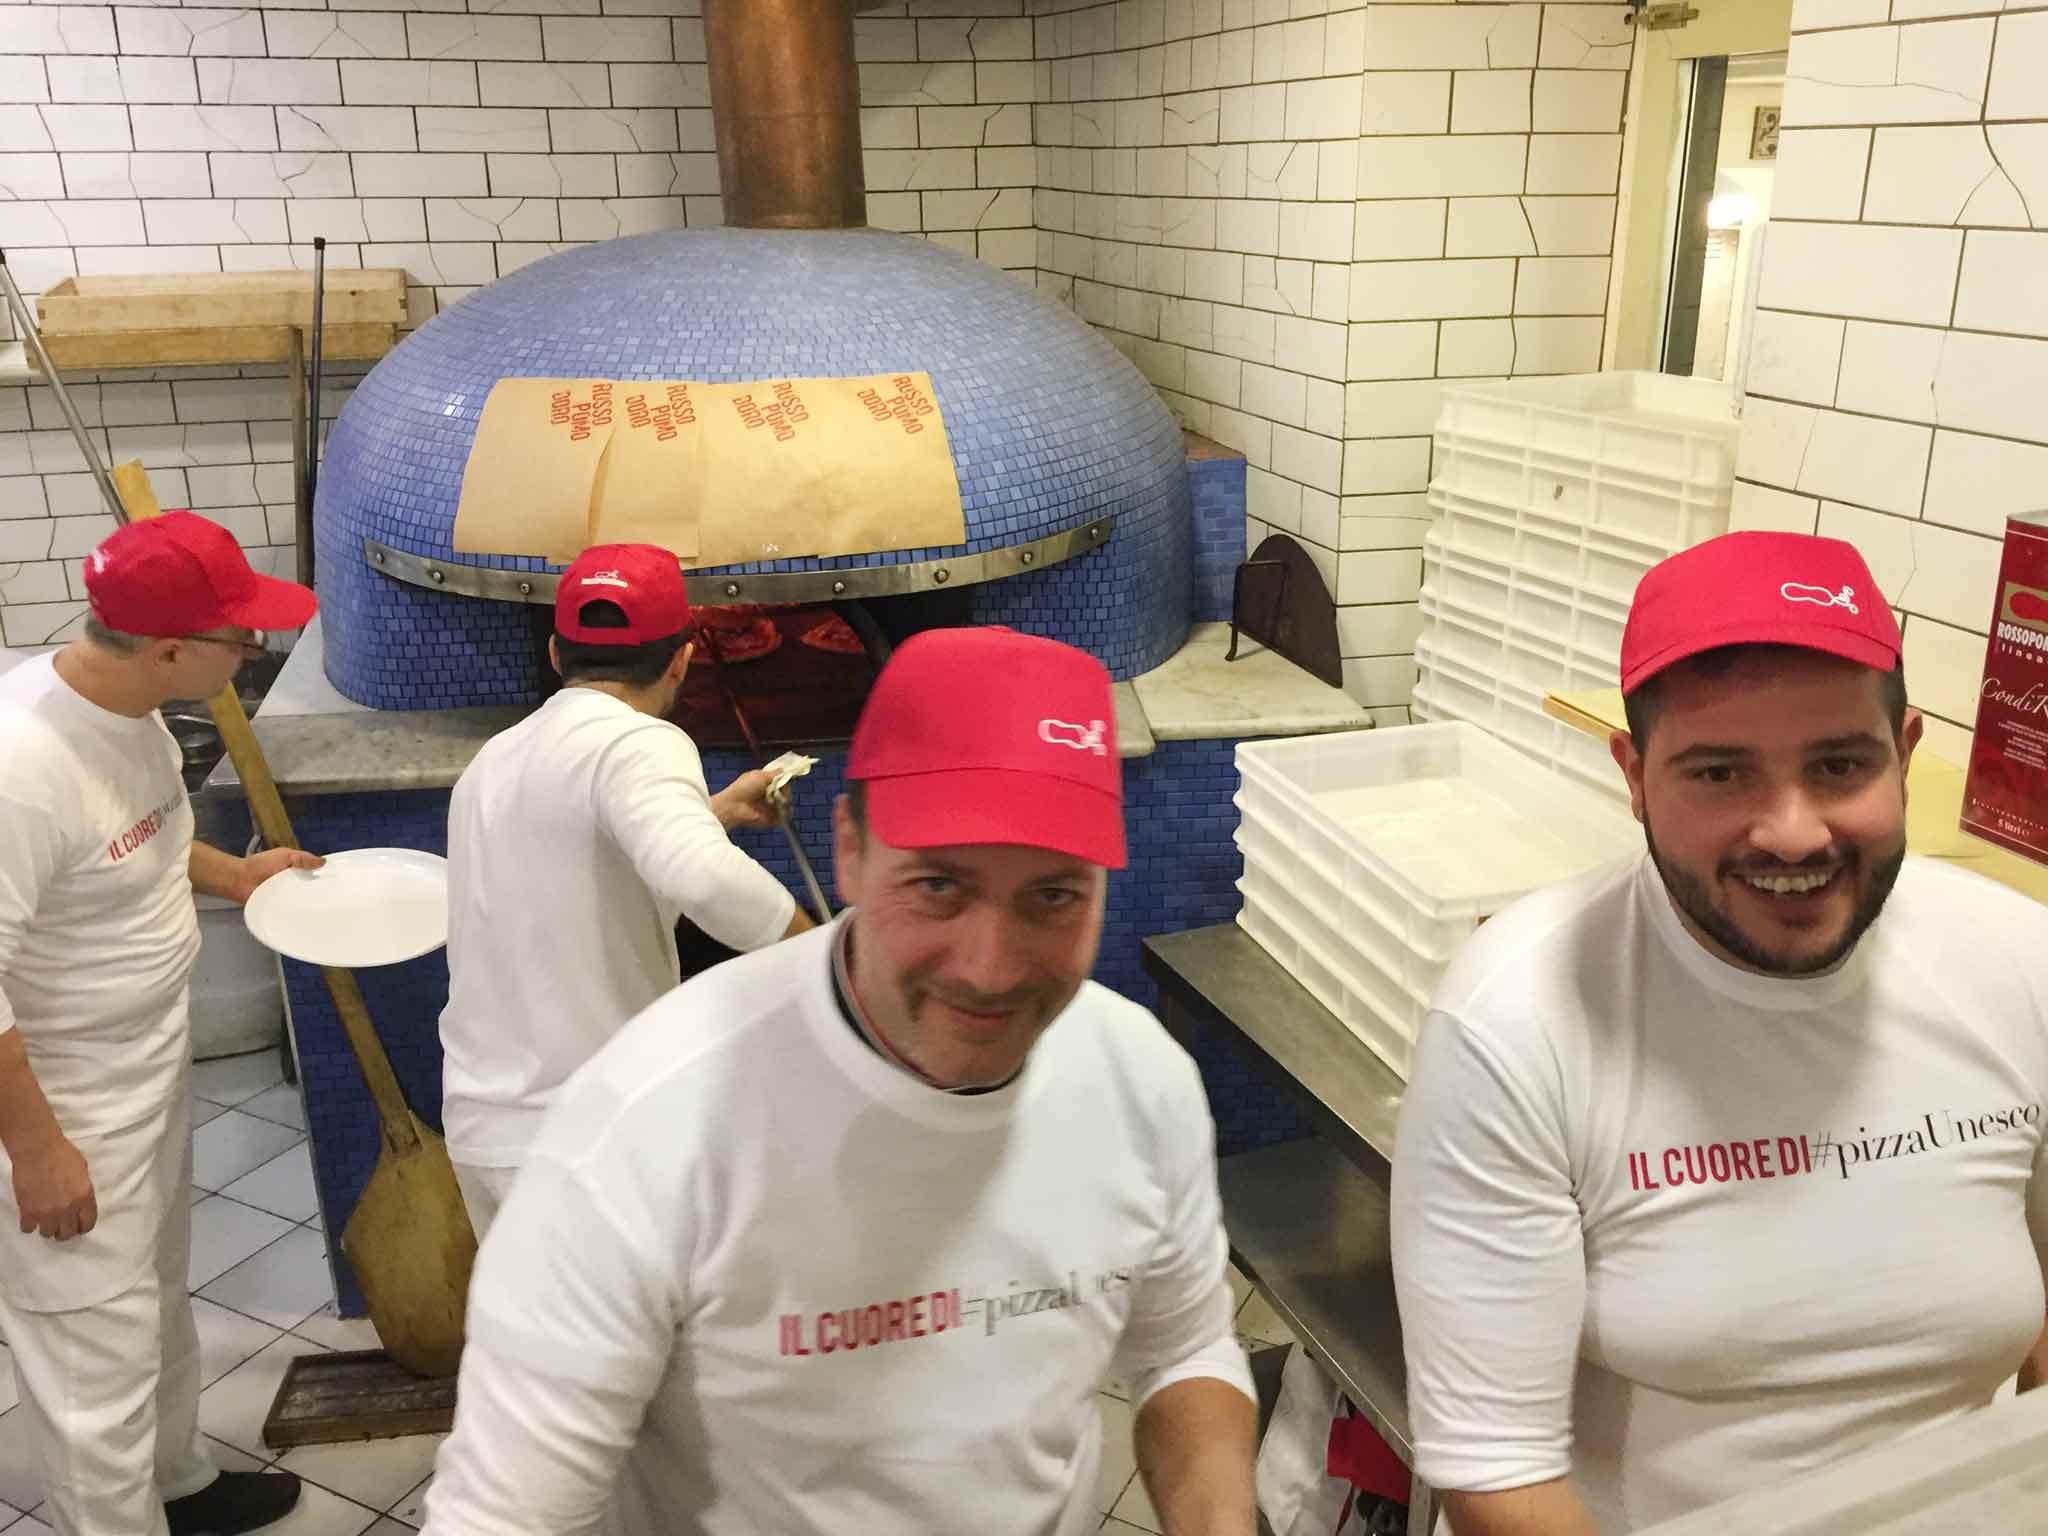 cuore #pizzaunesco 6